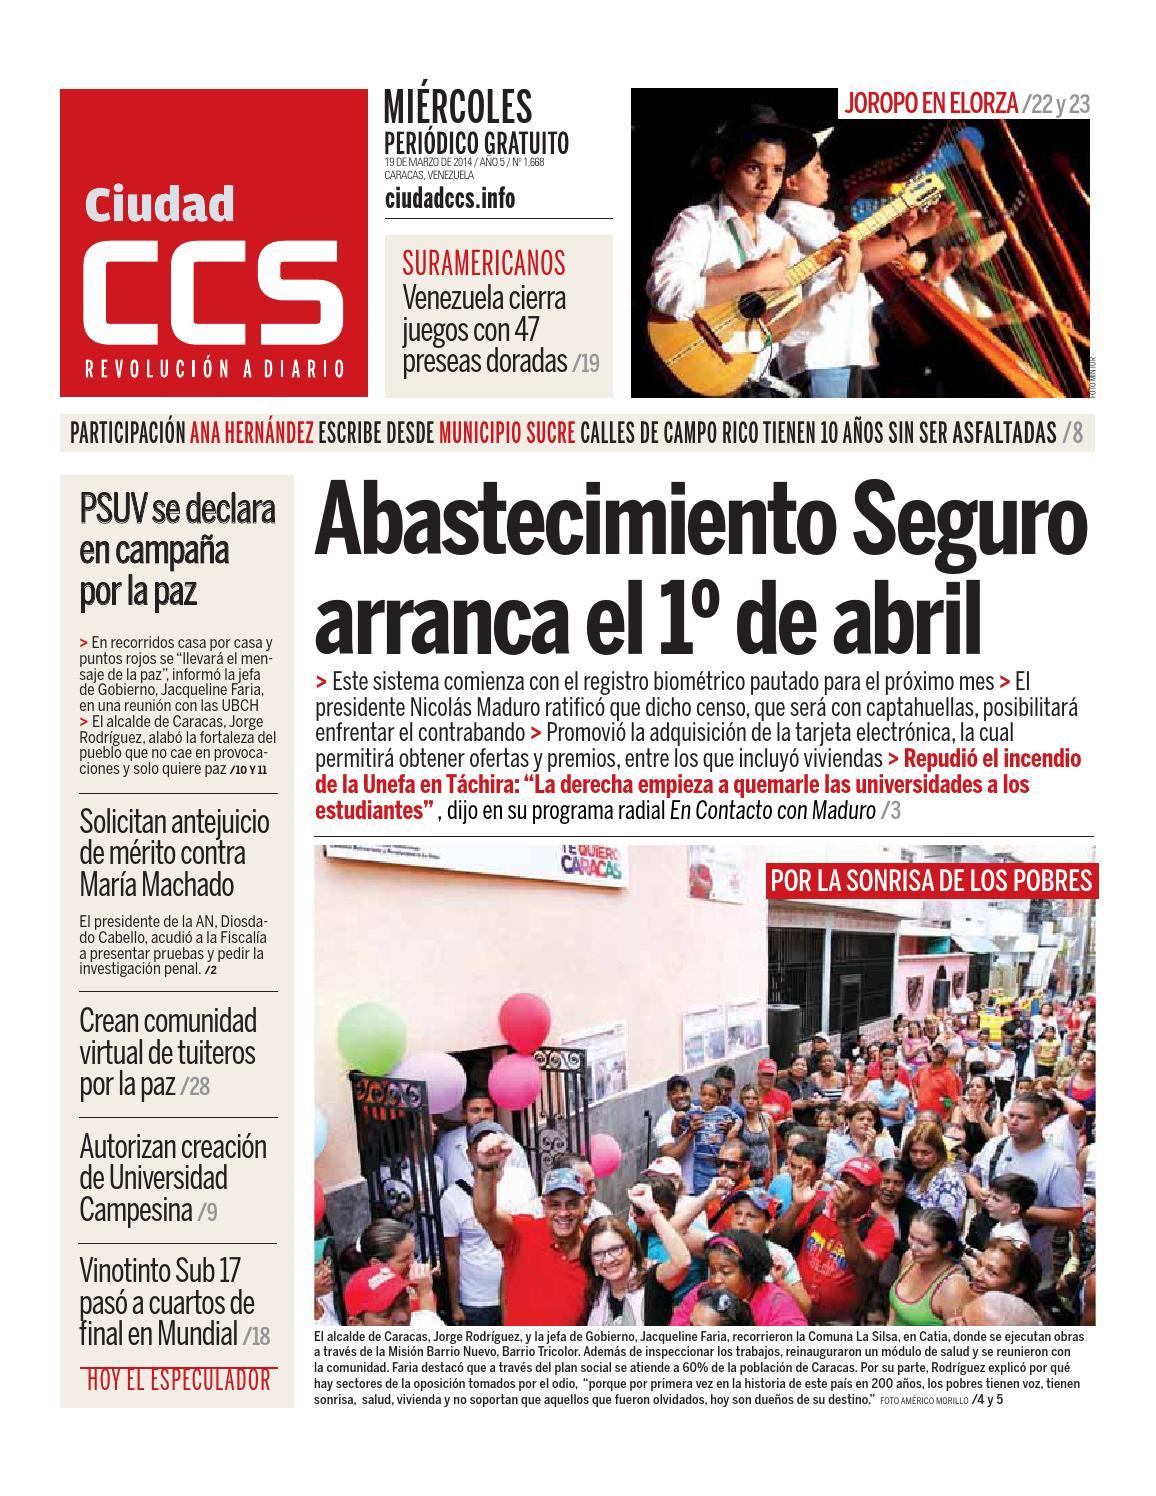 8d0e33e66f8 19 03 14 by Ciudad CCS - issuu